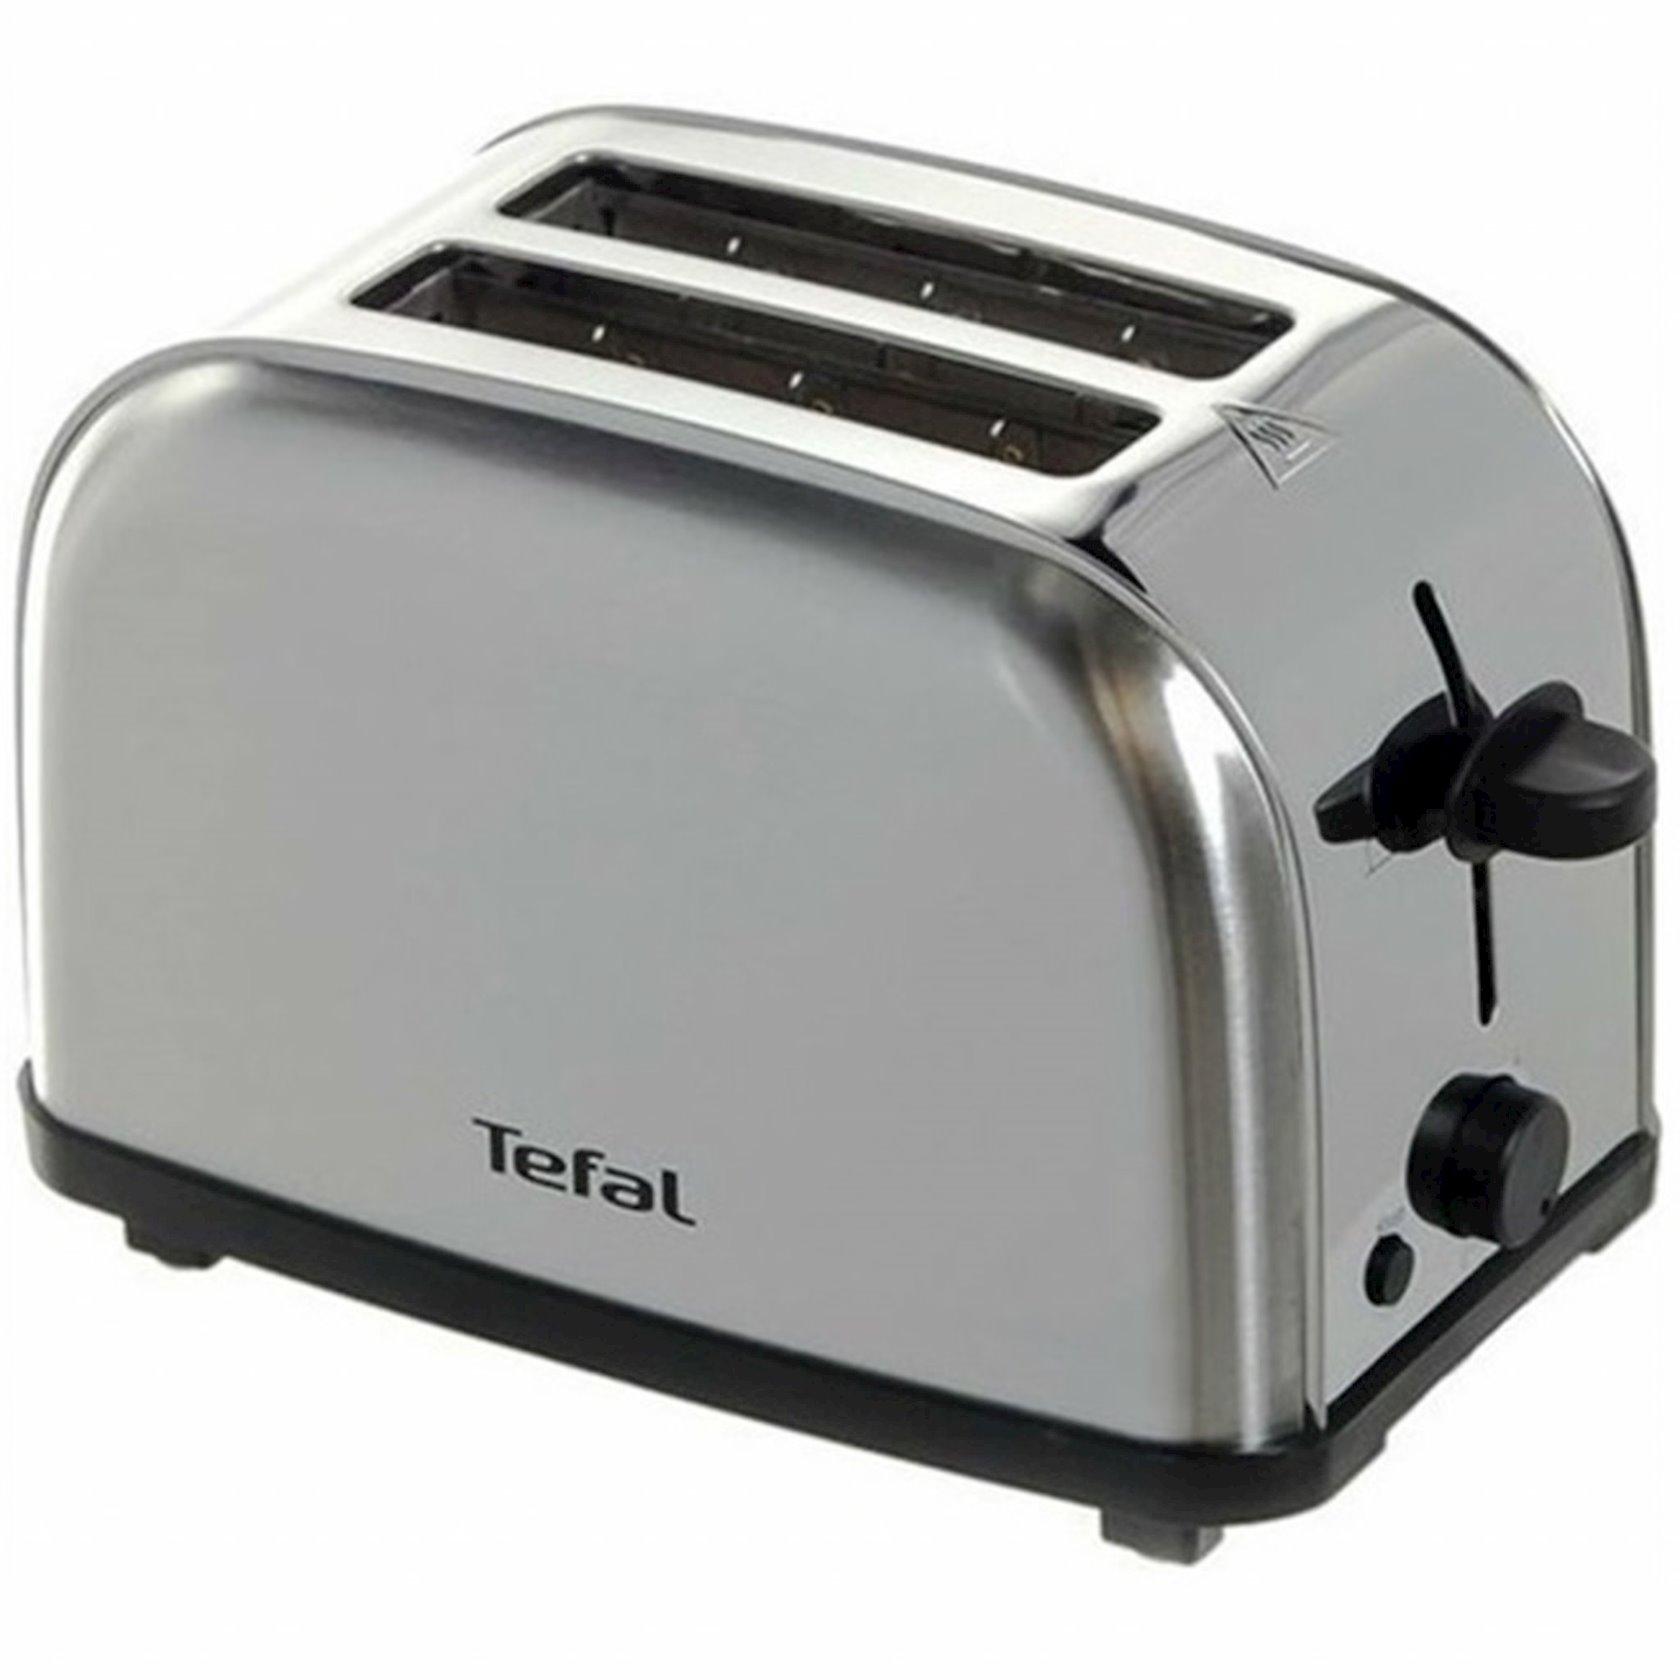 Toster Tefal Ultra Mini TT330D11